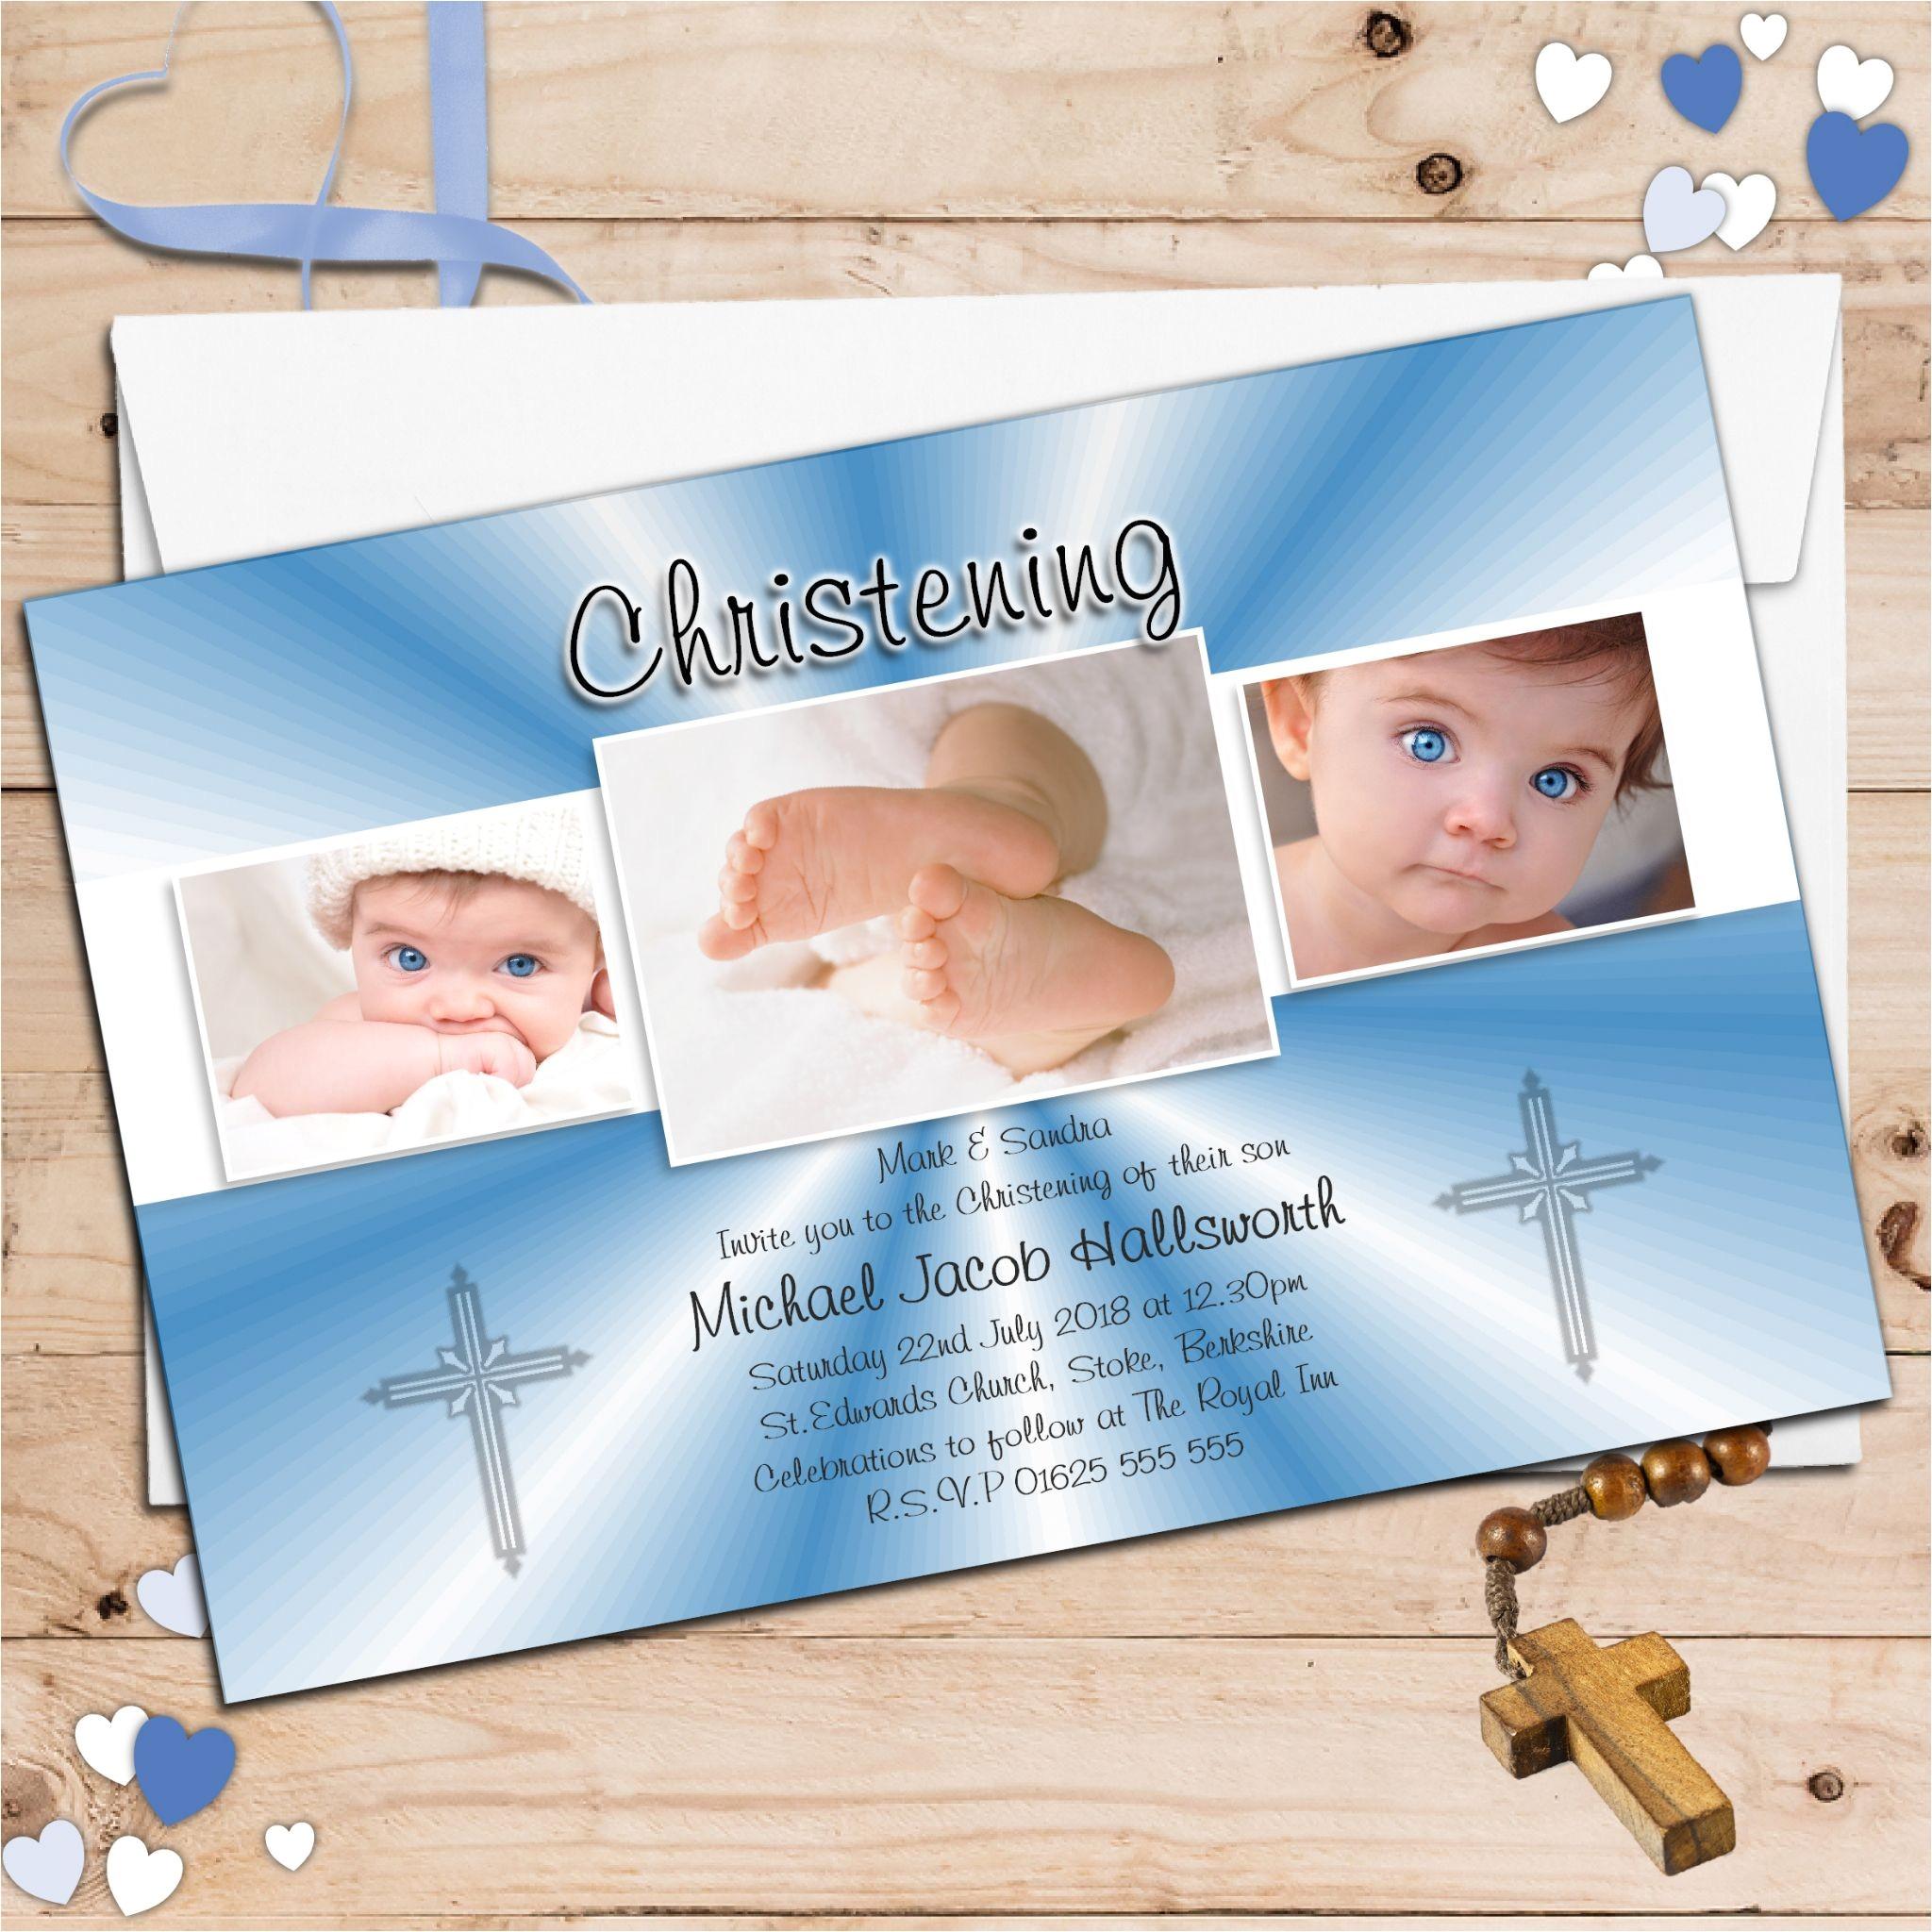 10 personalised boys christening baptism invitations photo invites n52 1718 p